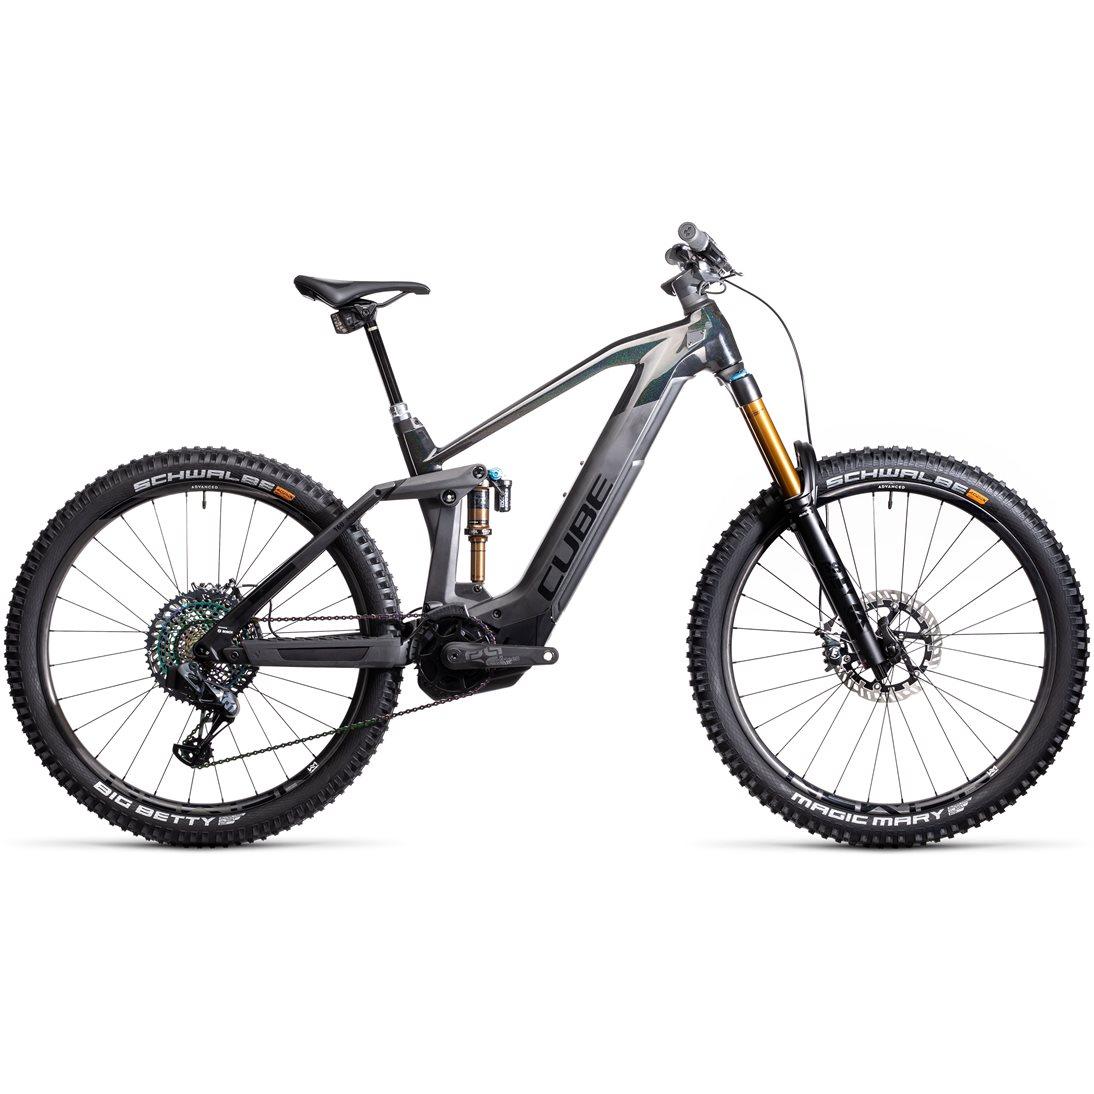 Cube Stereo Hybrid 160 C62 SLT 625wh Carbon Electric Bike 2021